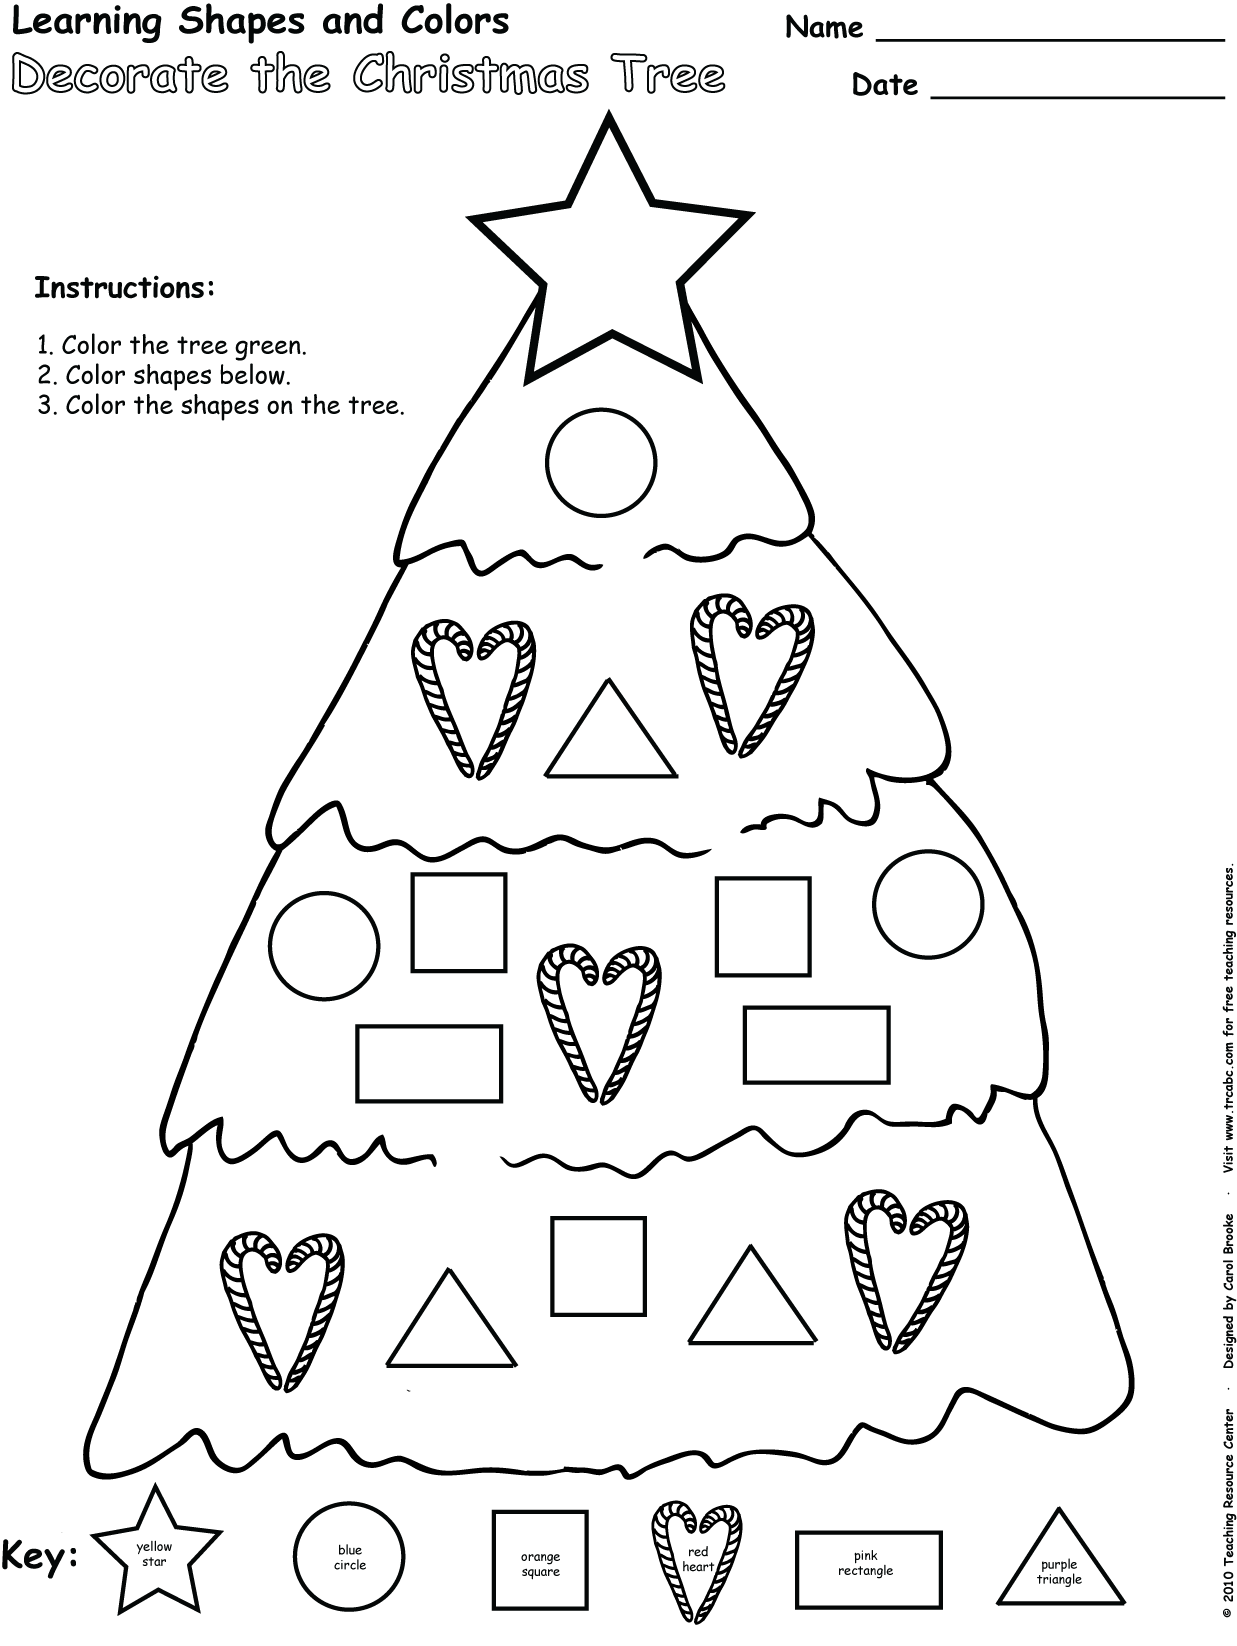 Blog Christmastree Learningshapesandcolors